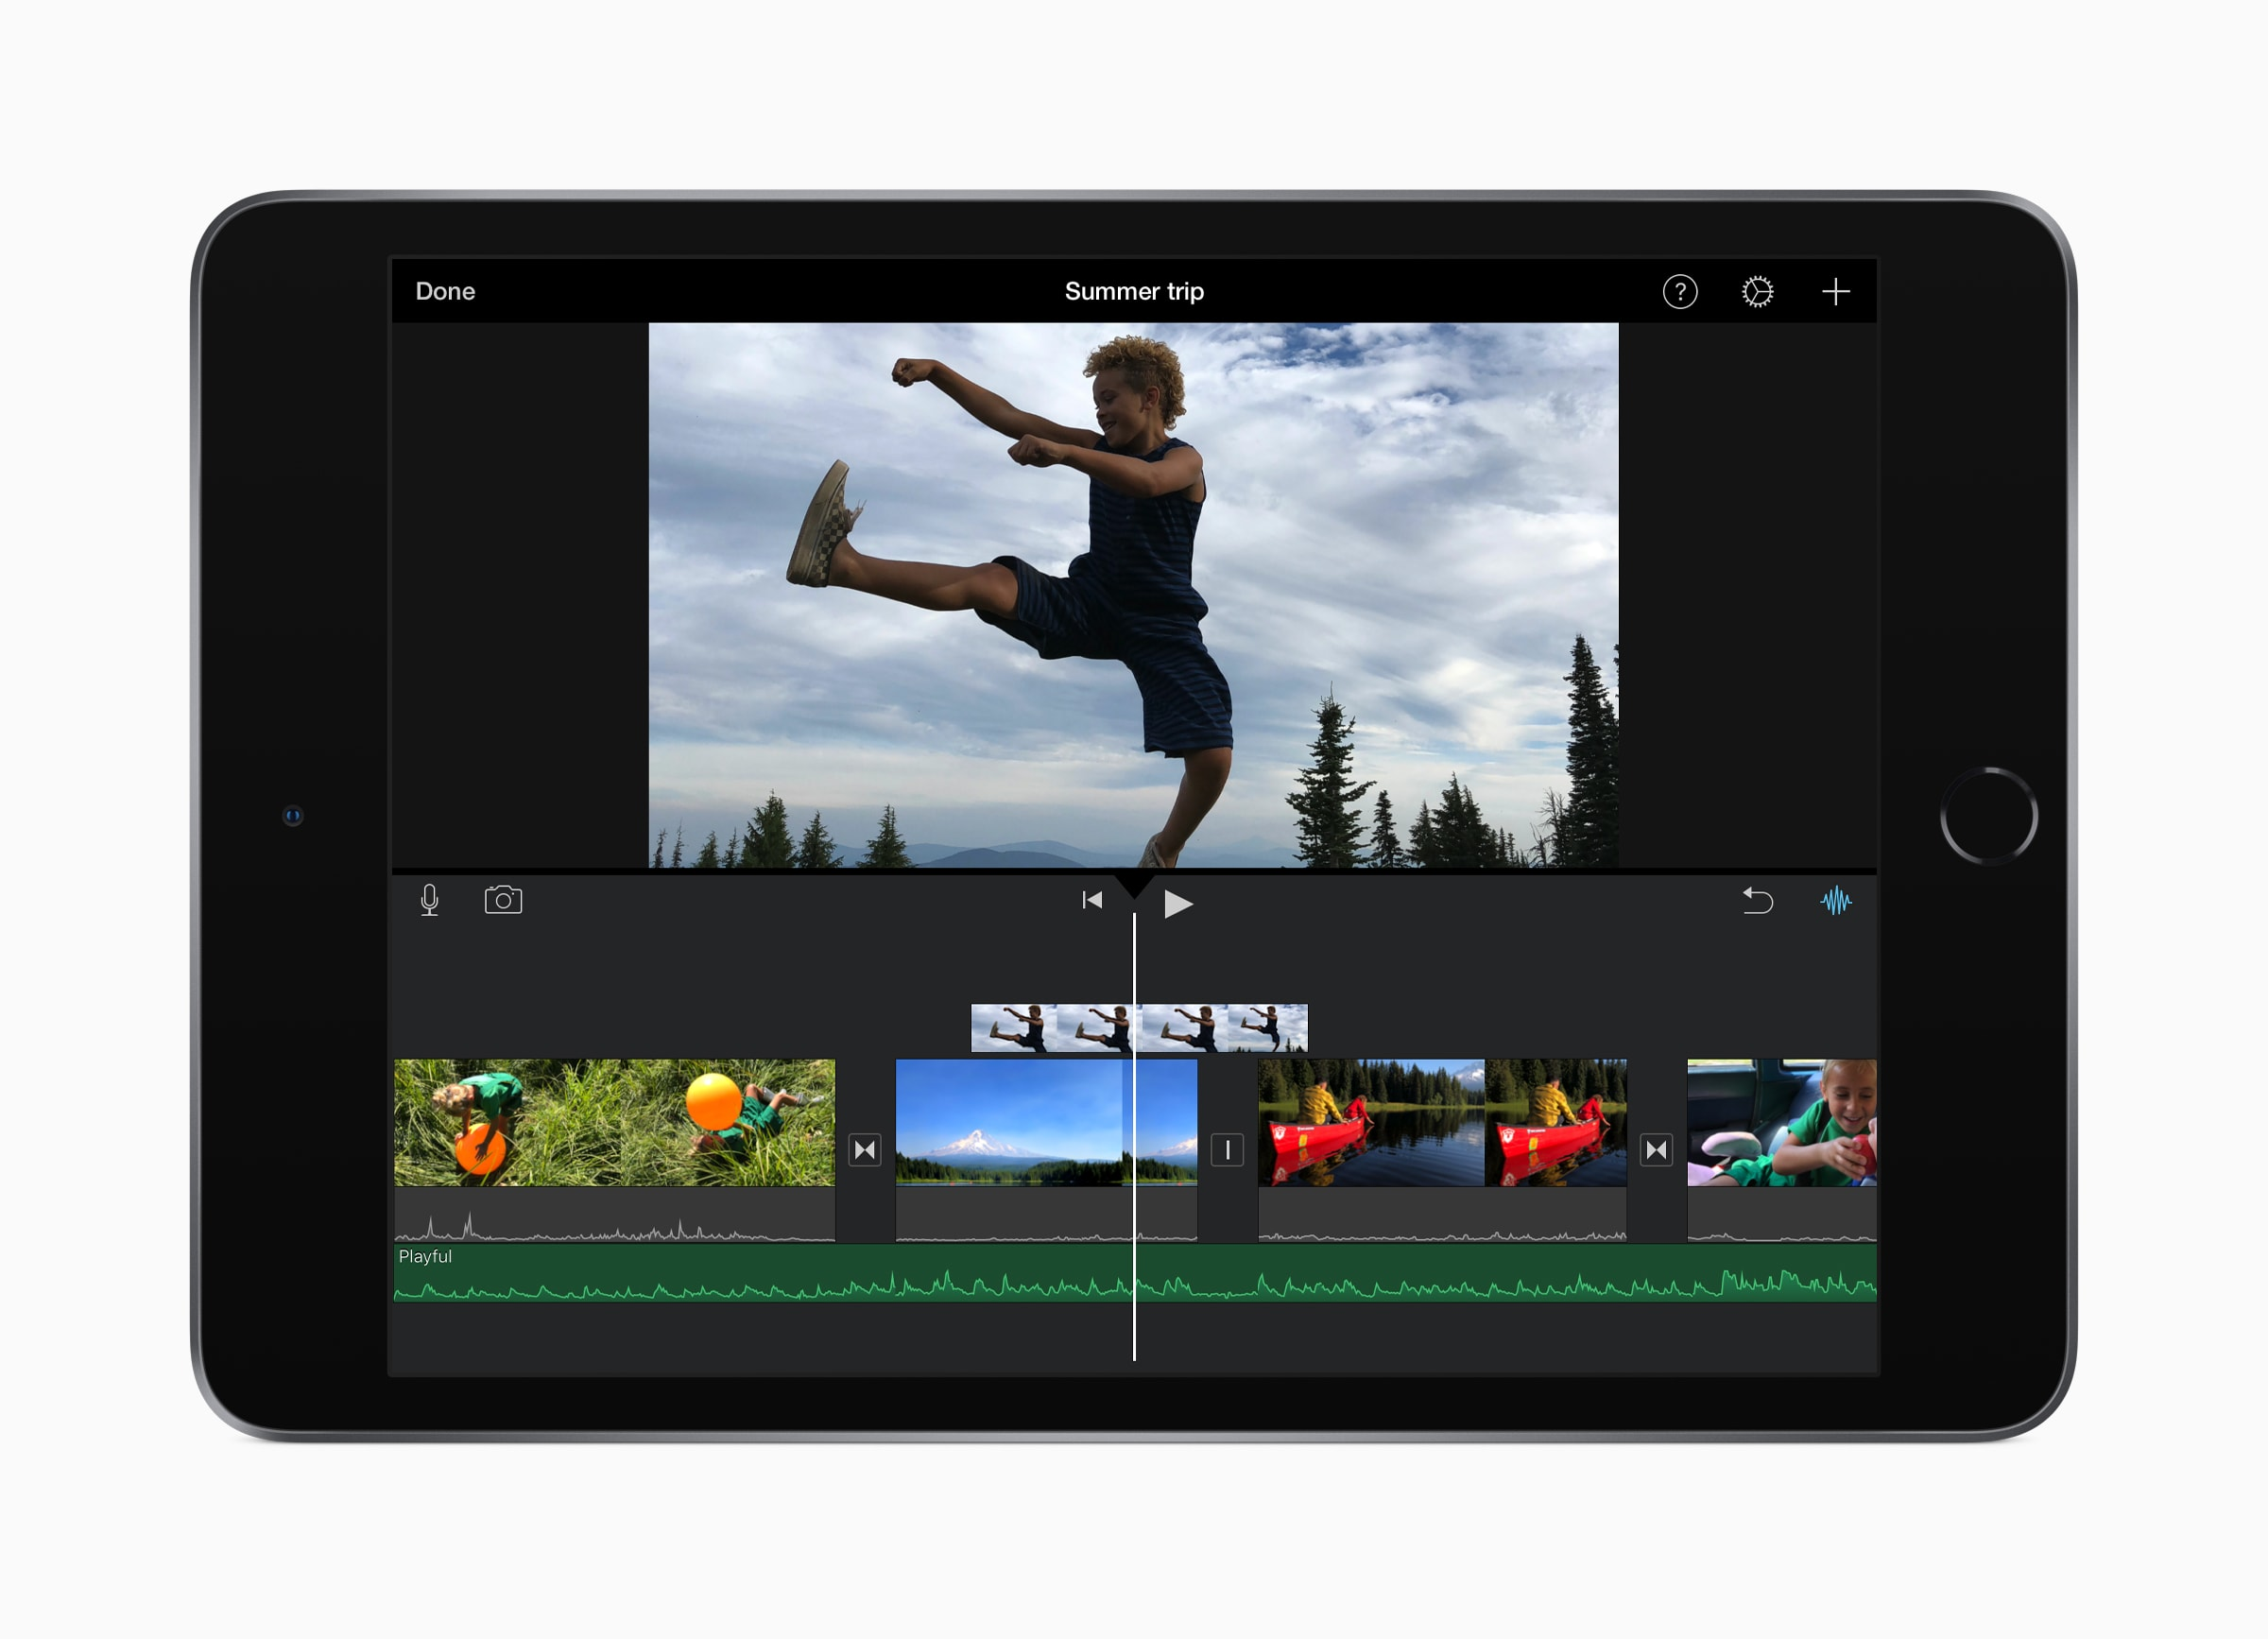 iPad mini editando filme no iMovie